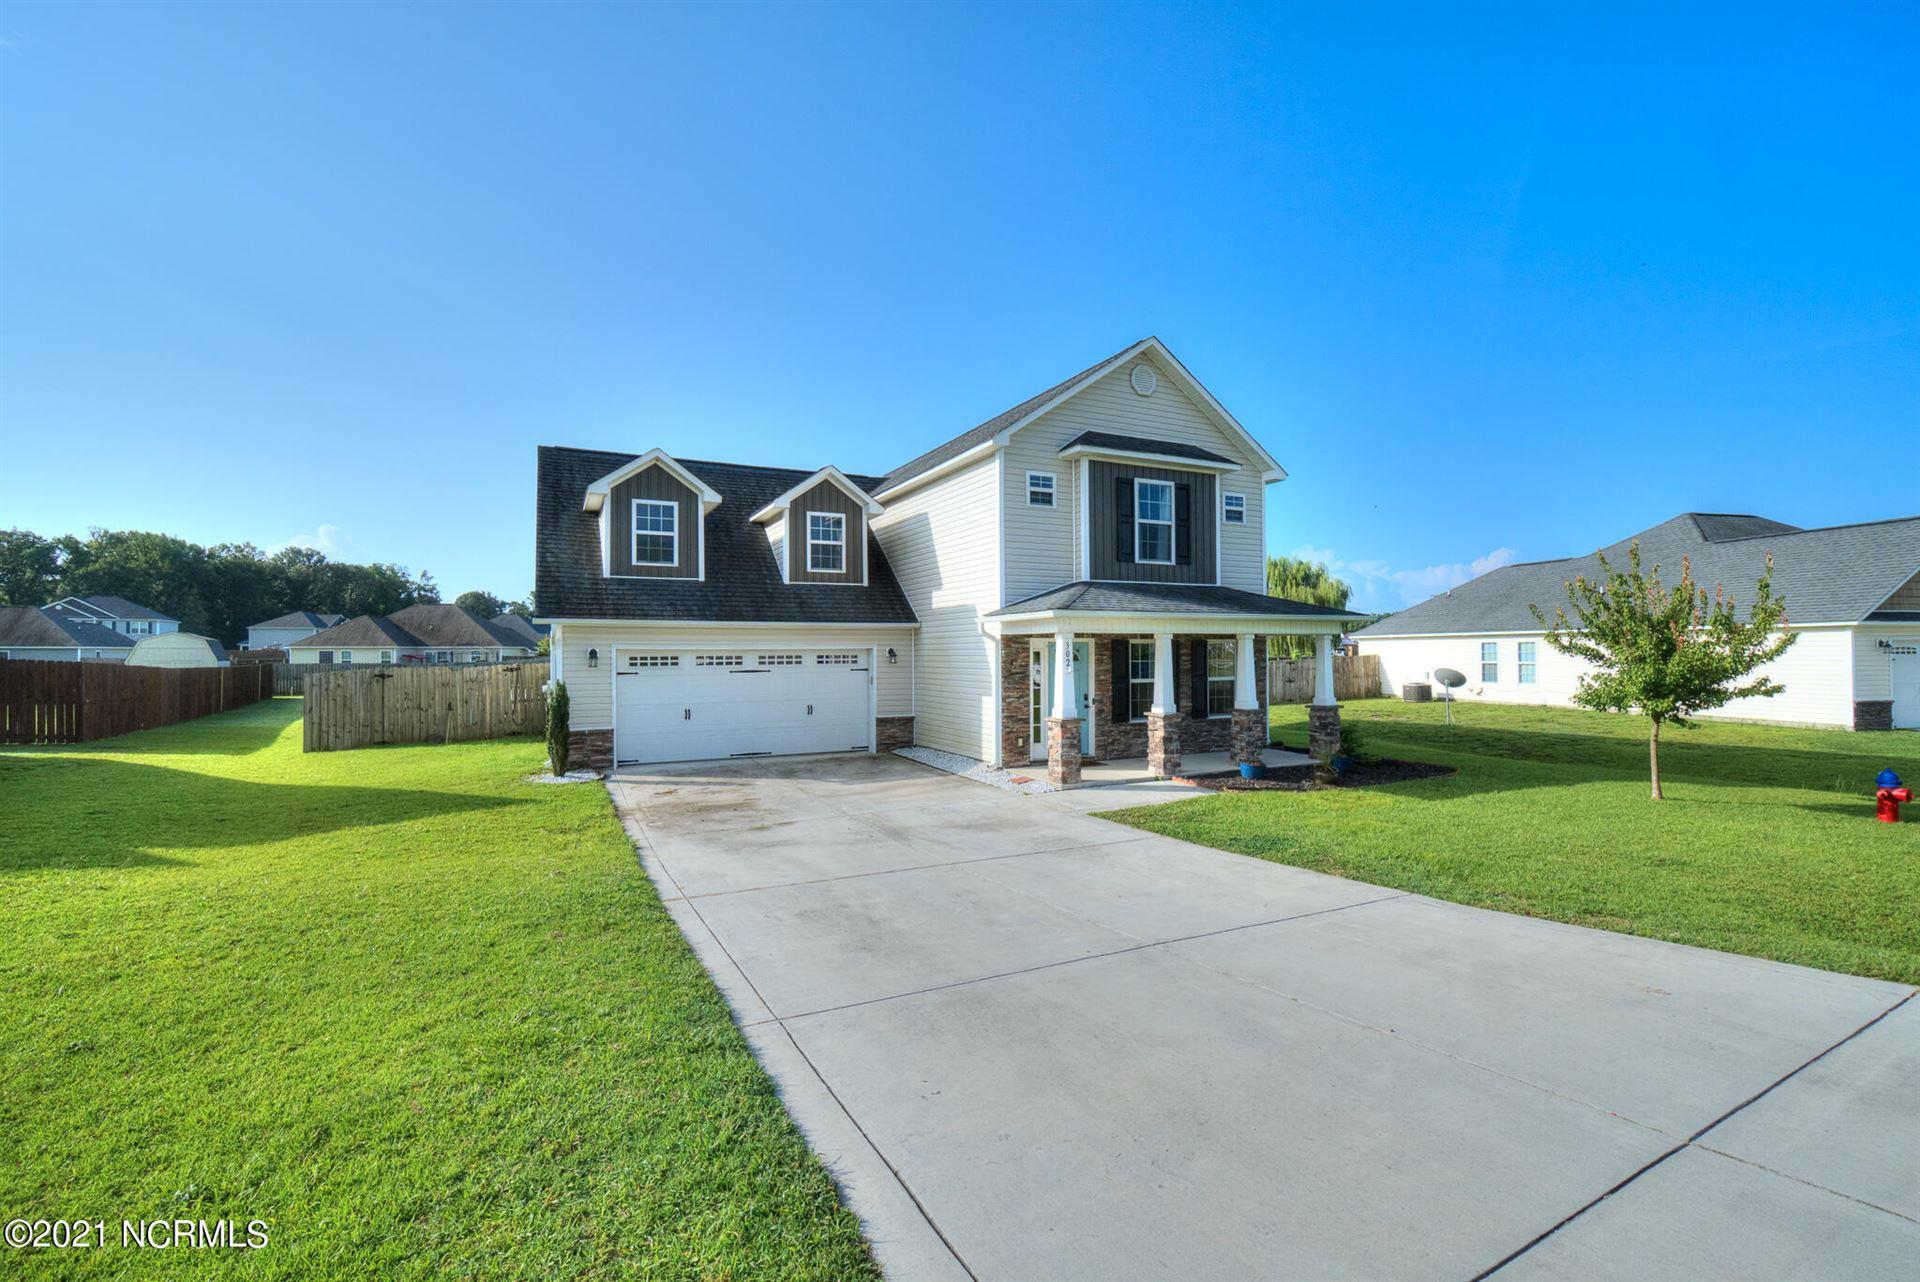 Photo of 302 Cadenza Lane, Richlands, NC 28574 (MLS # 100283002)